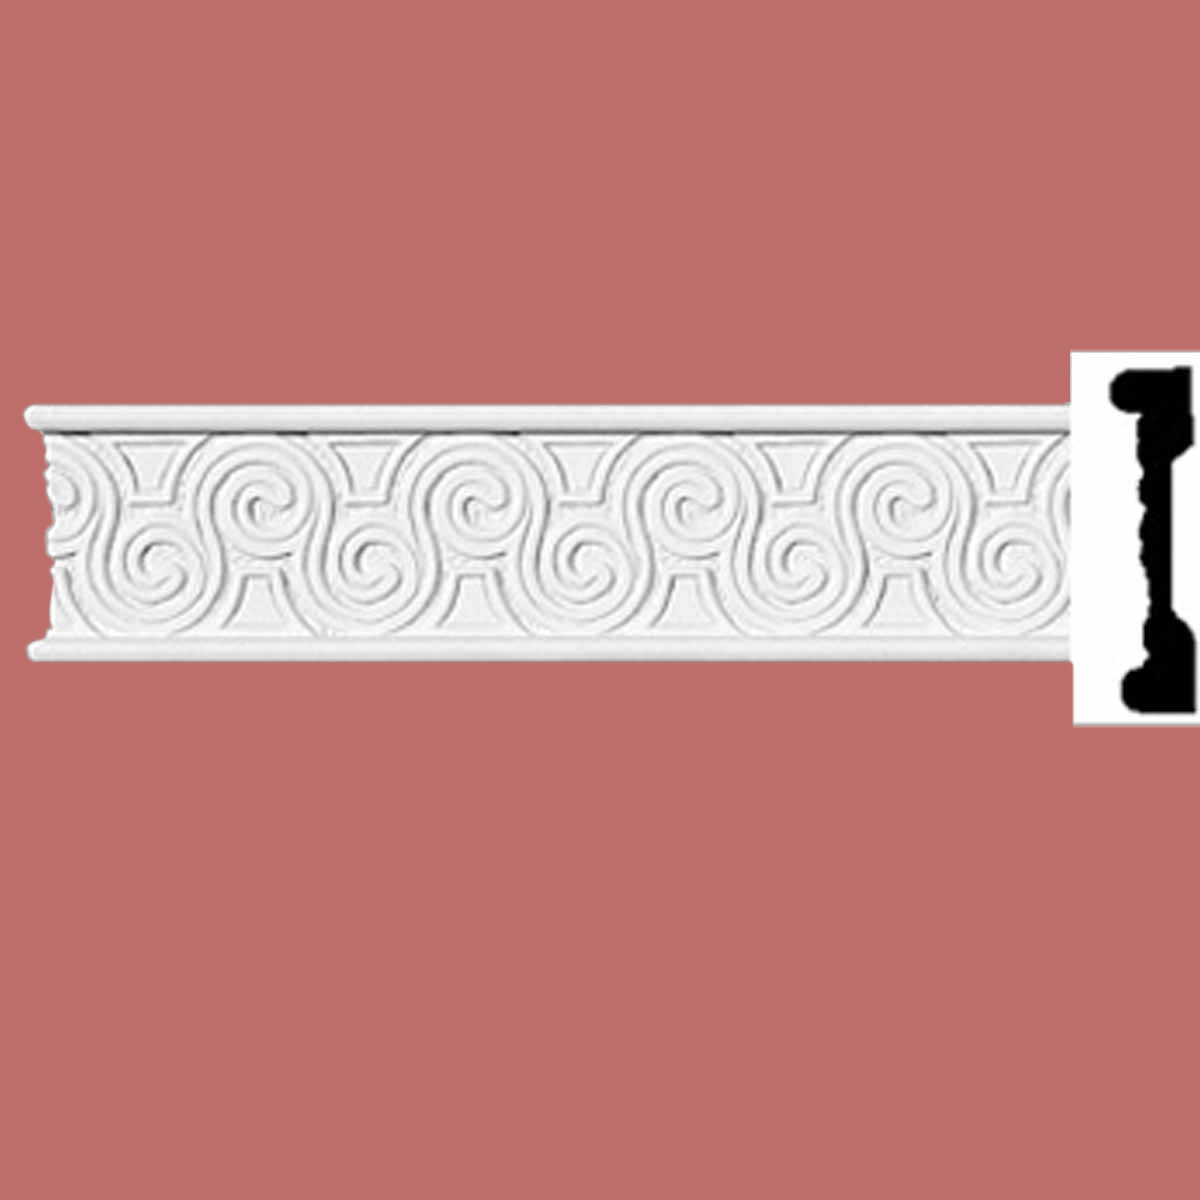 Cornice White Urethane Sample of 11617 Crown Molding Crown Moldings Crown Moulding